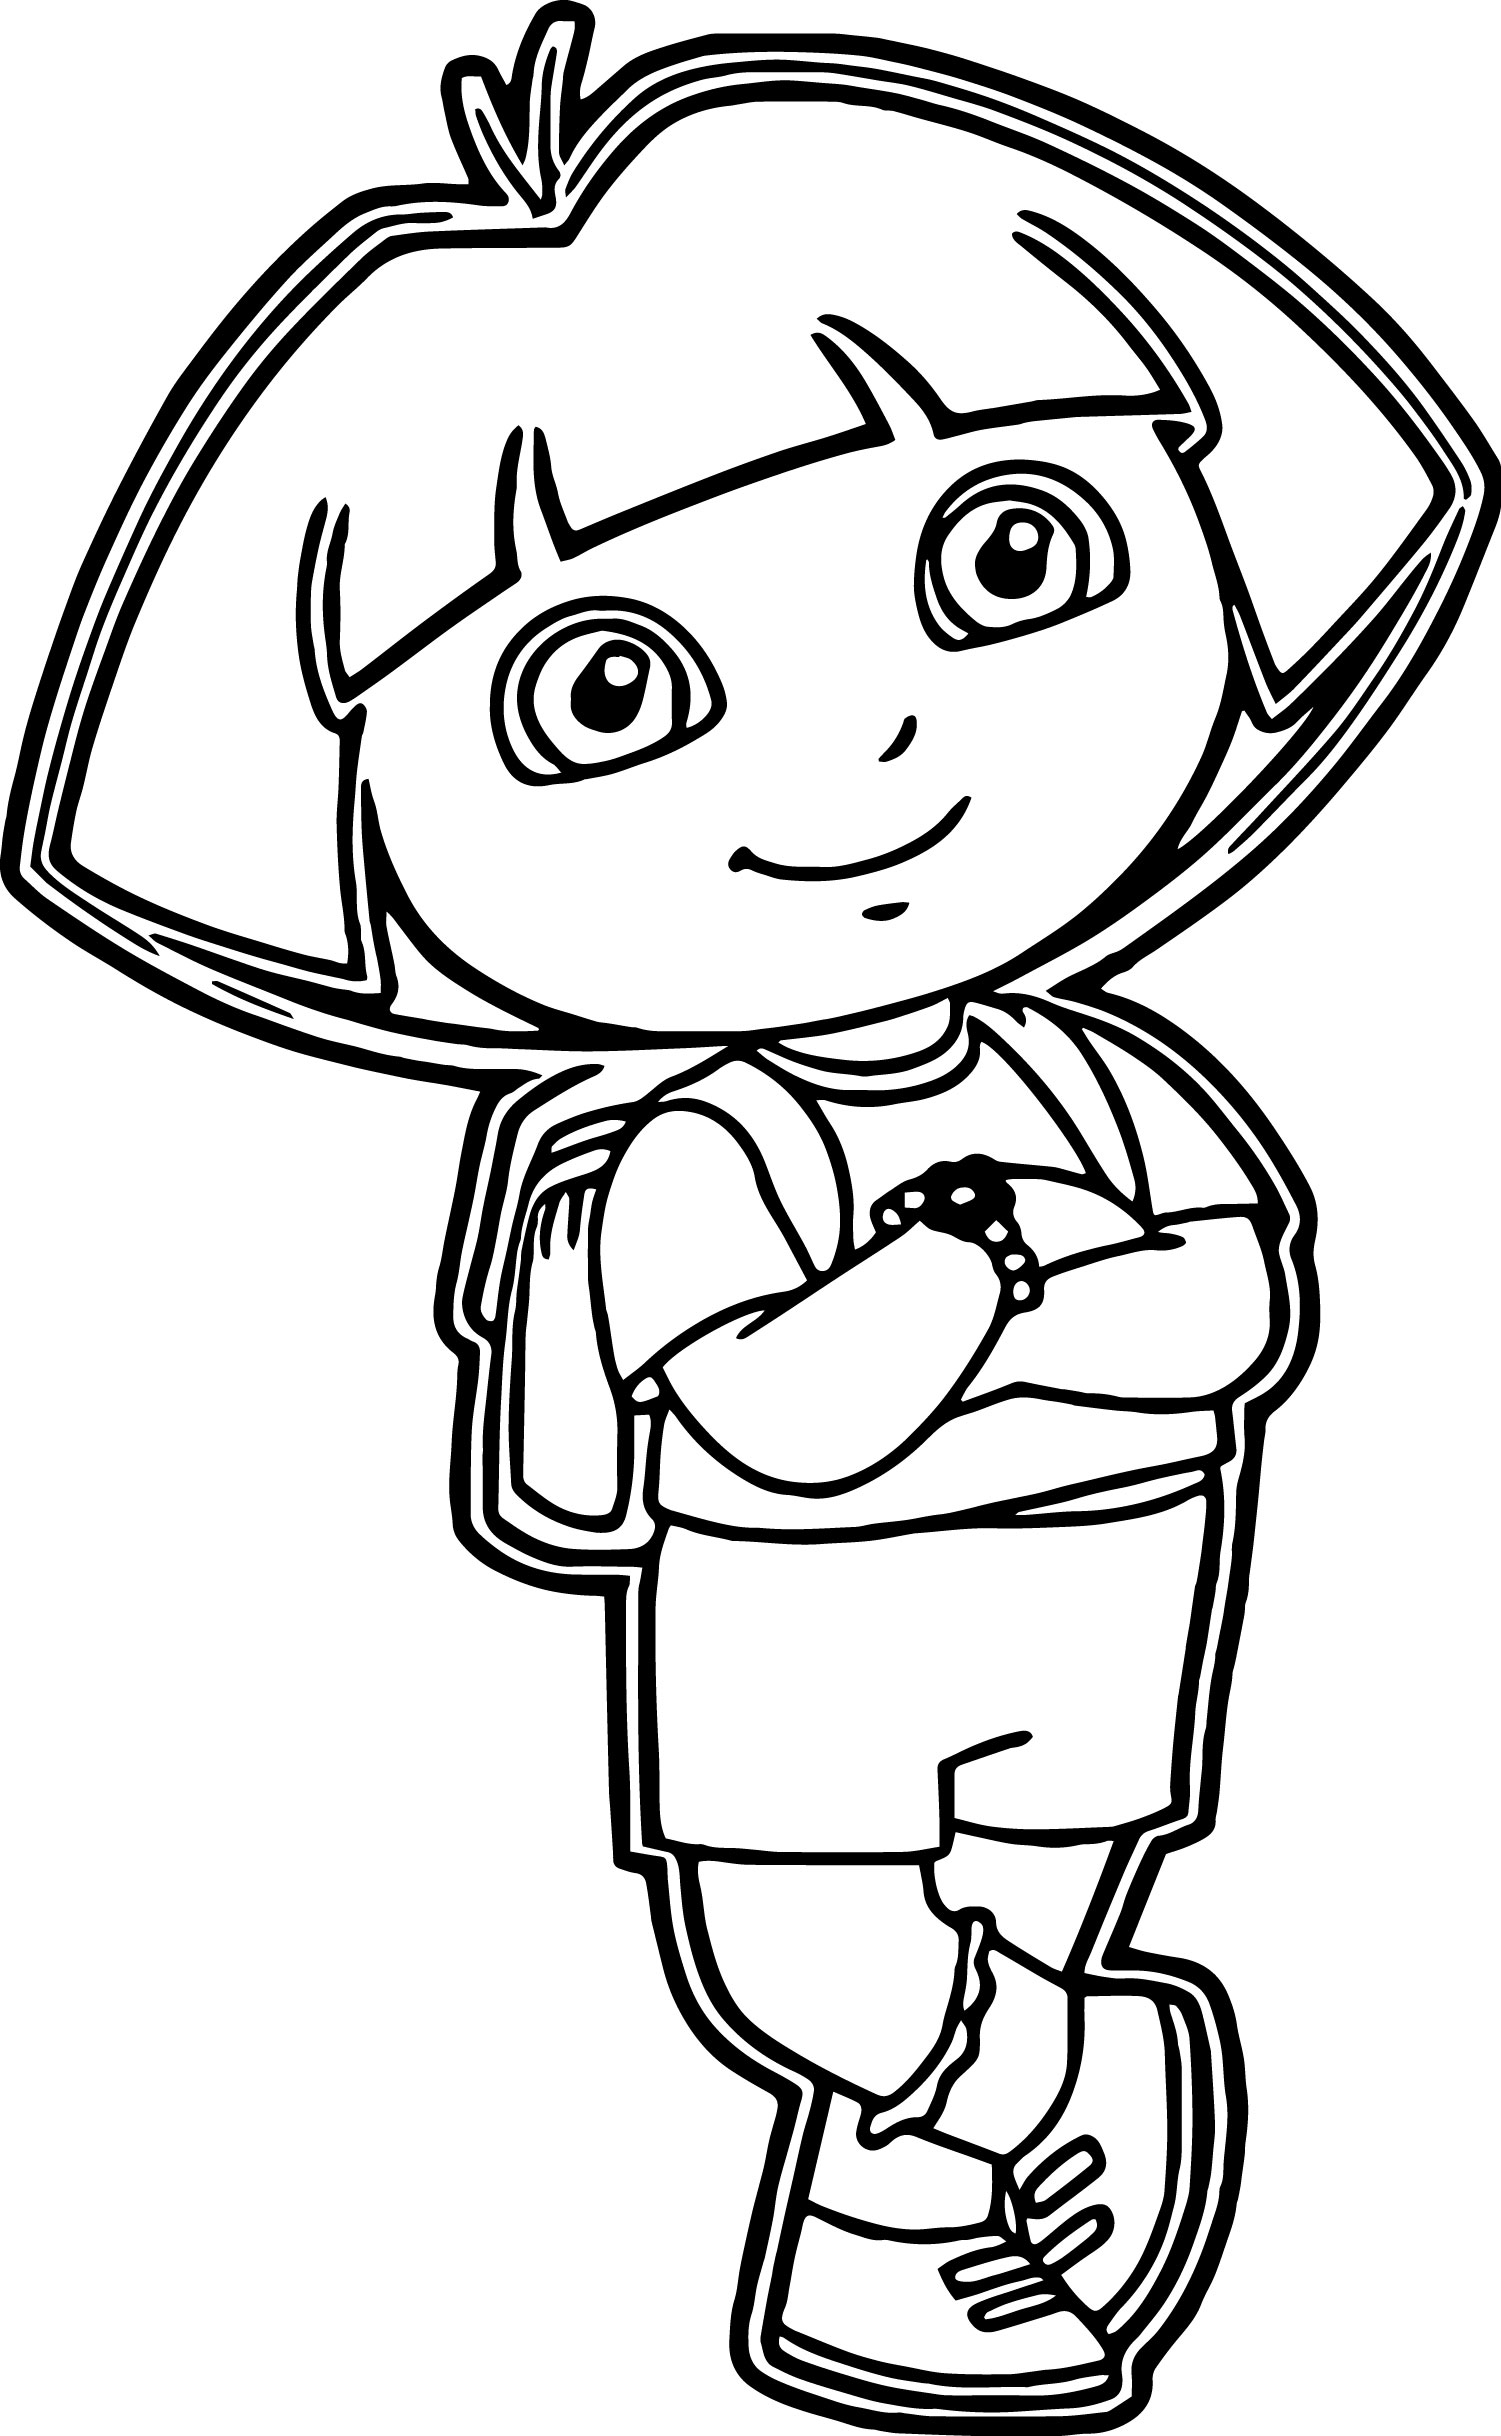 Dora The Explorer Coloring Page 17